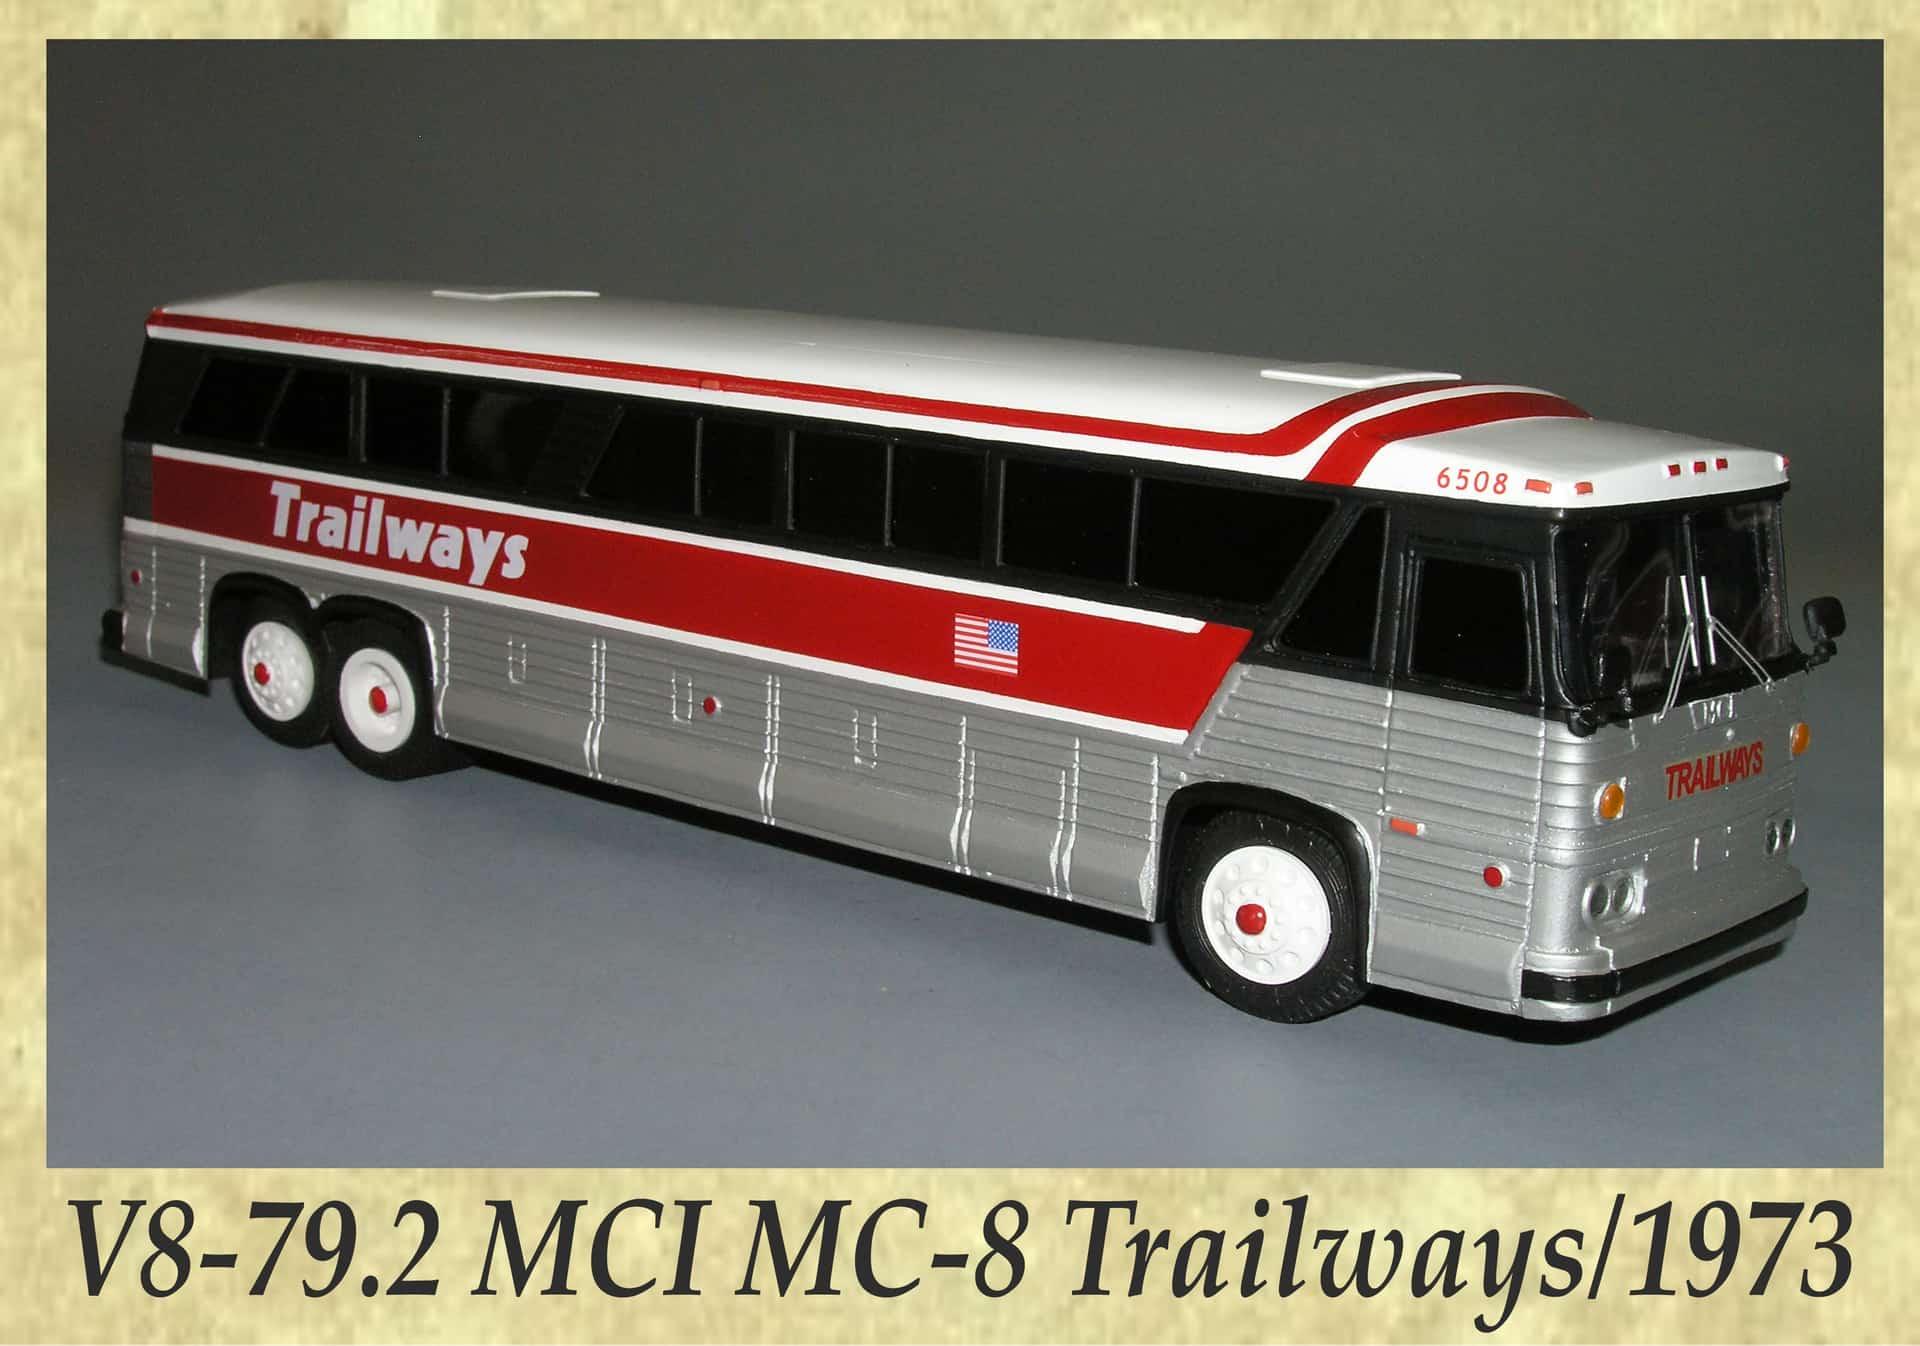 V8-79.2 MCI MC-8 Trailways 1973